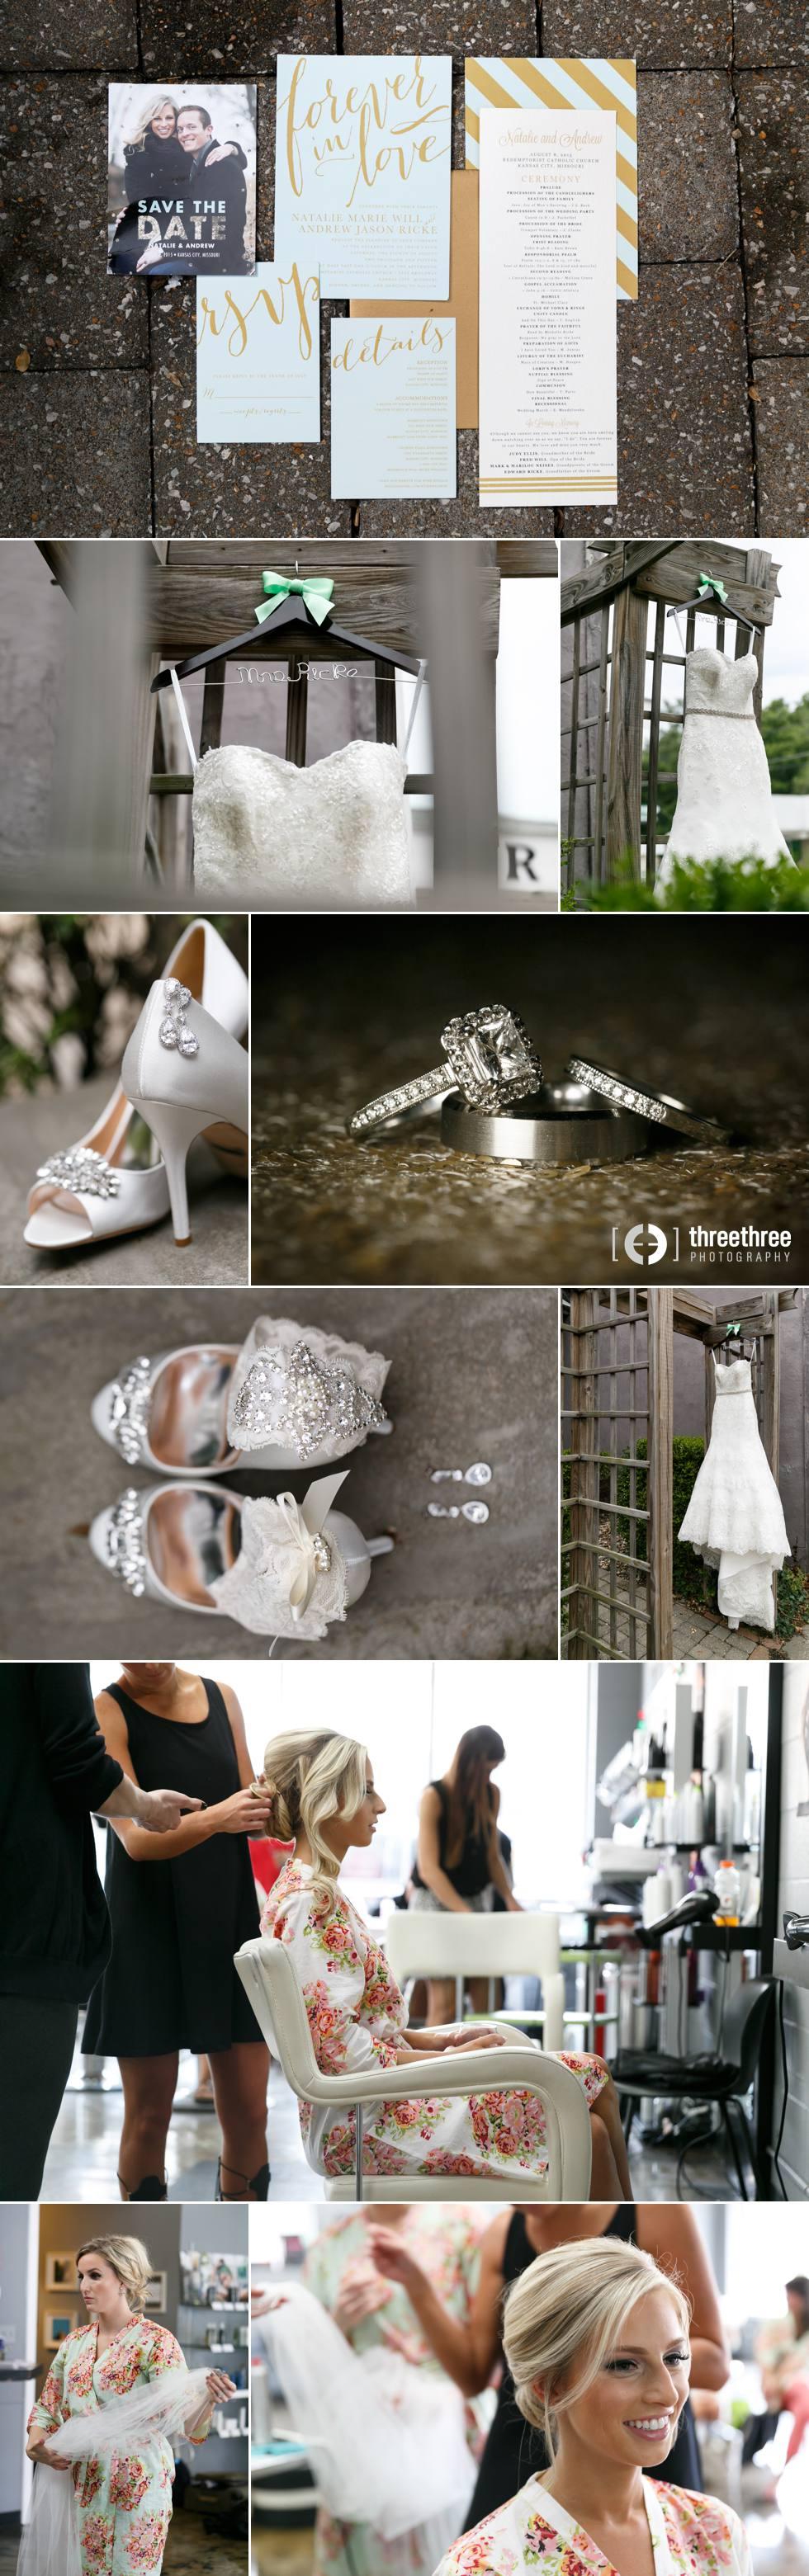 Natalie_AJ_wedding 1